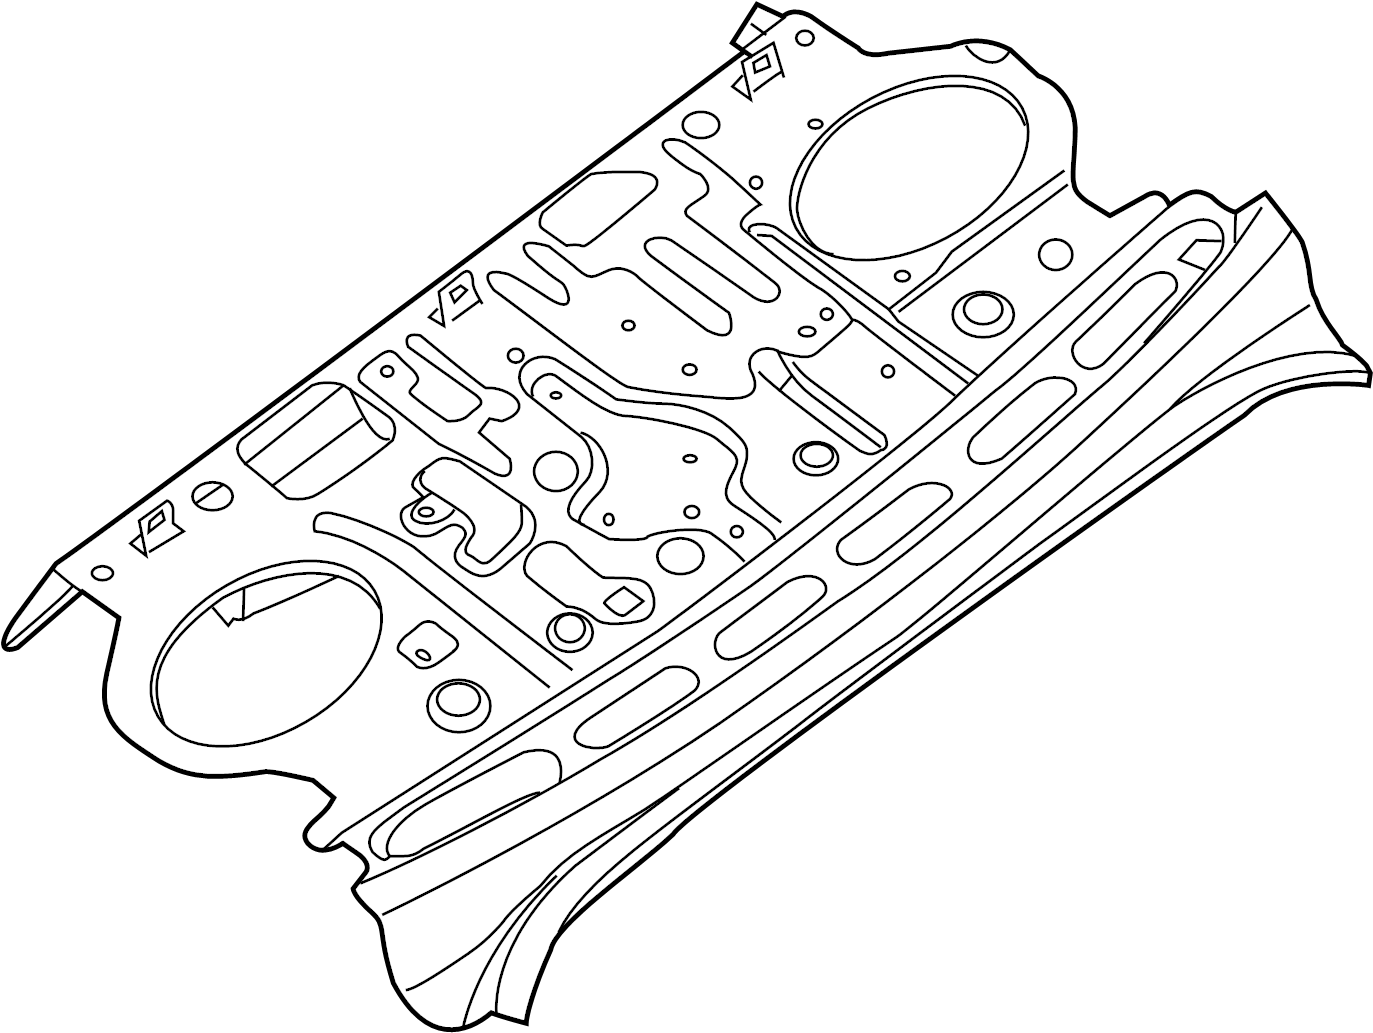 Nissan Maxima Package Tray Rear